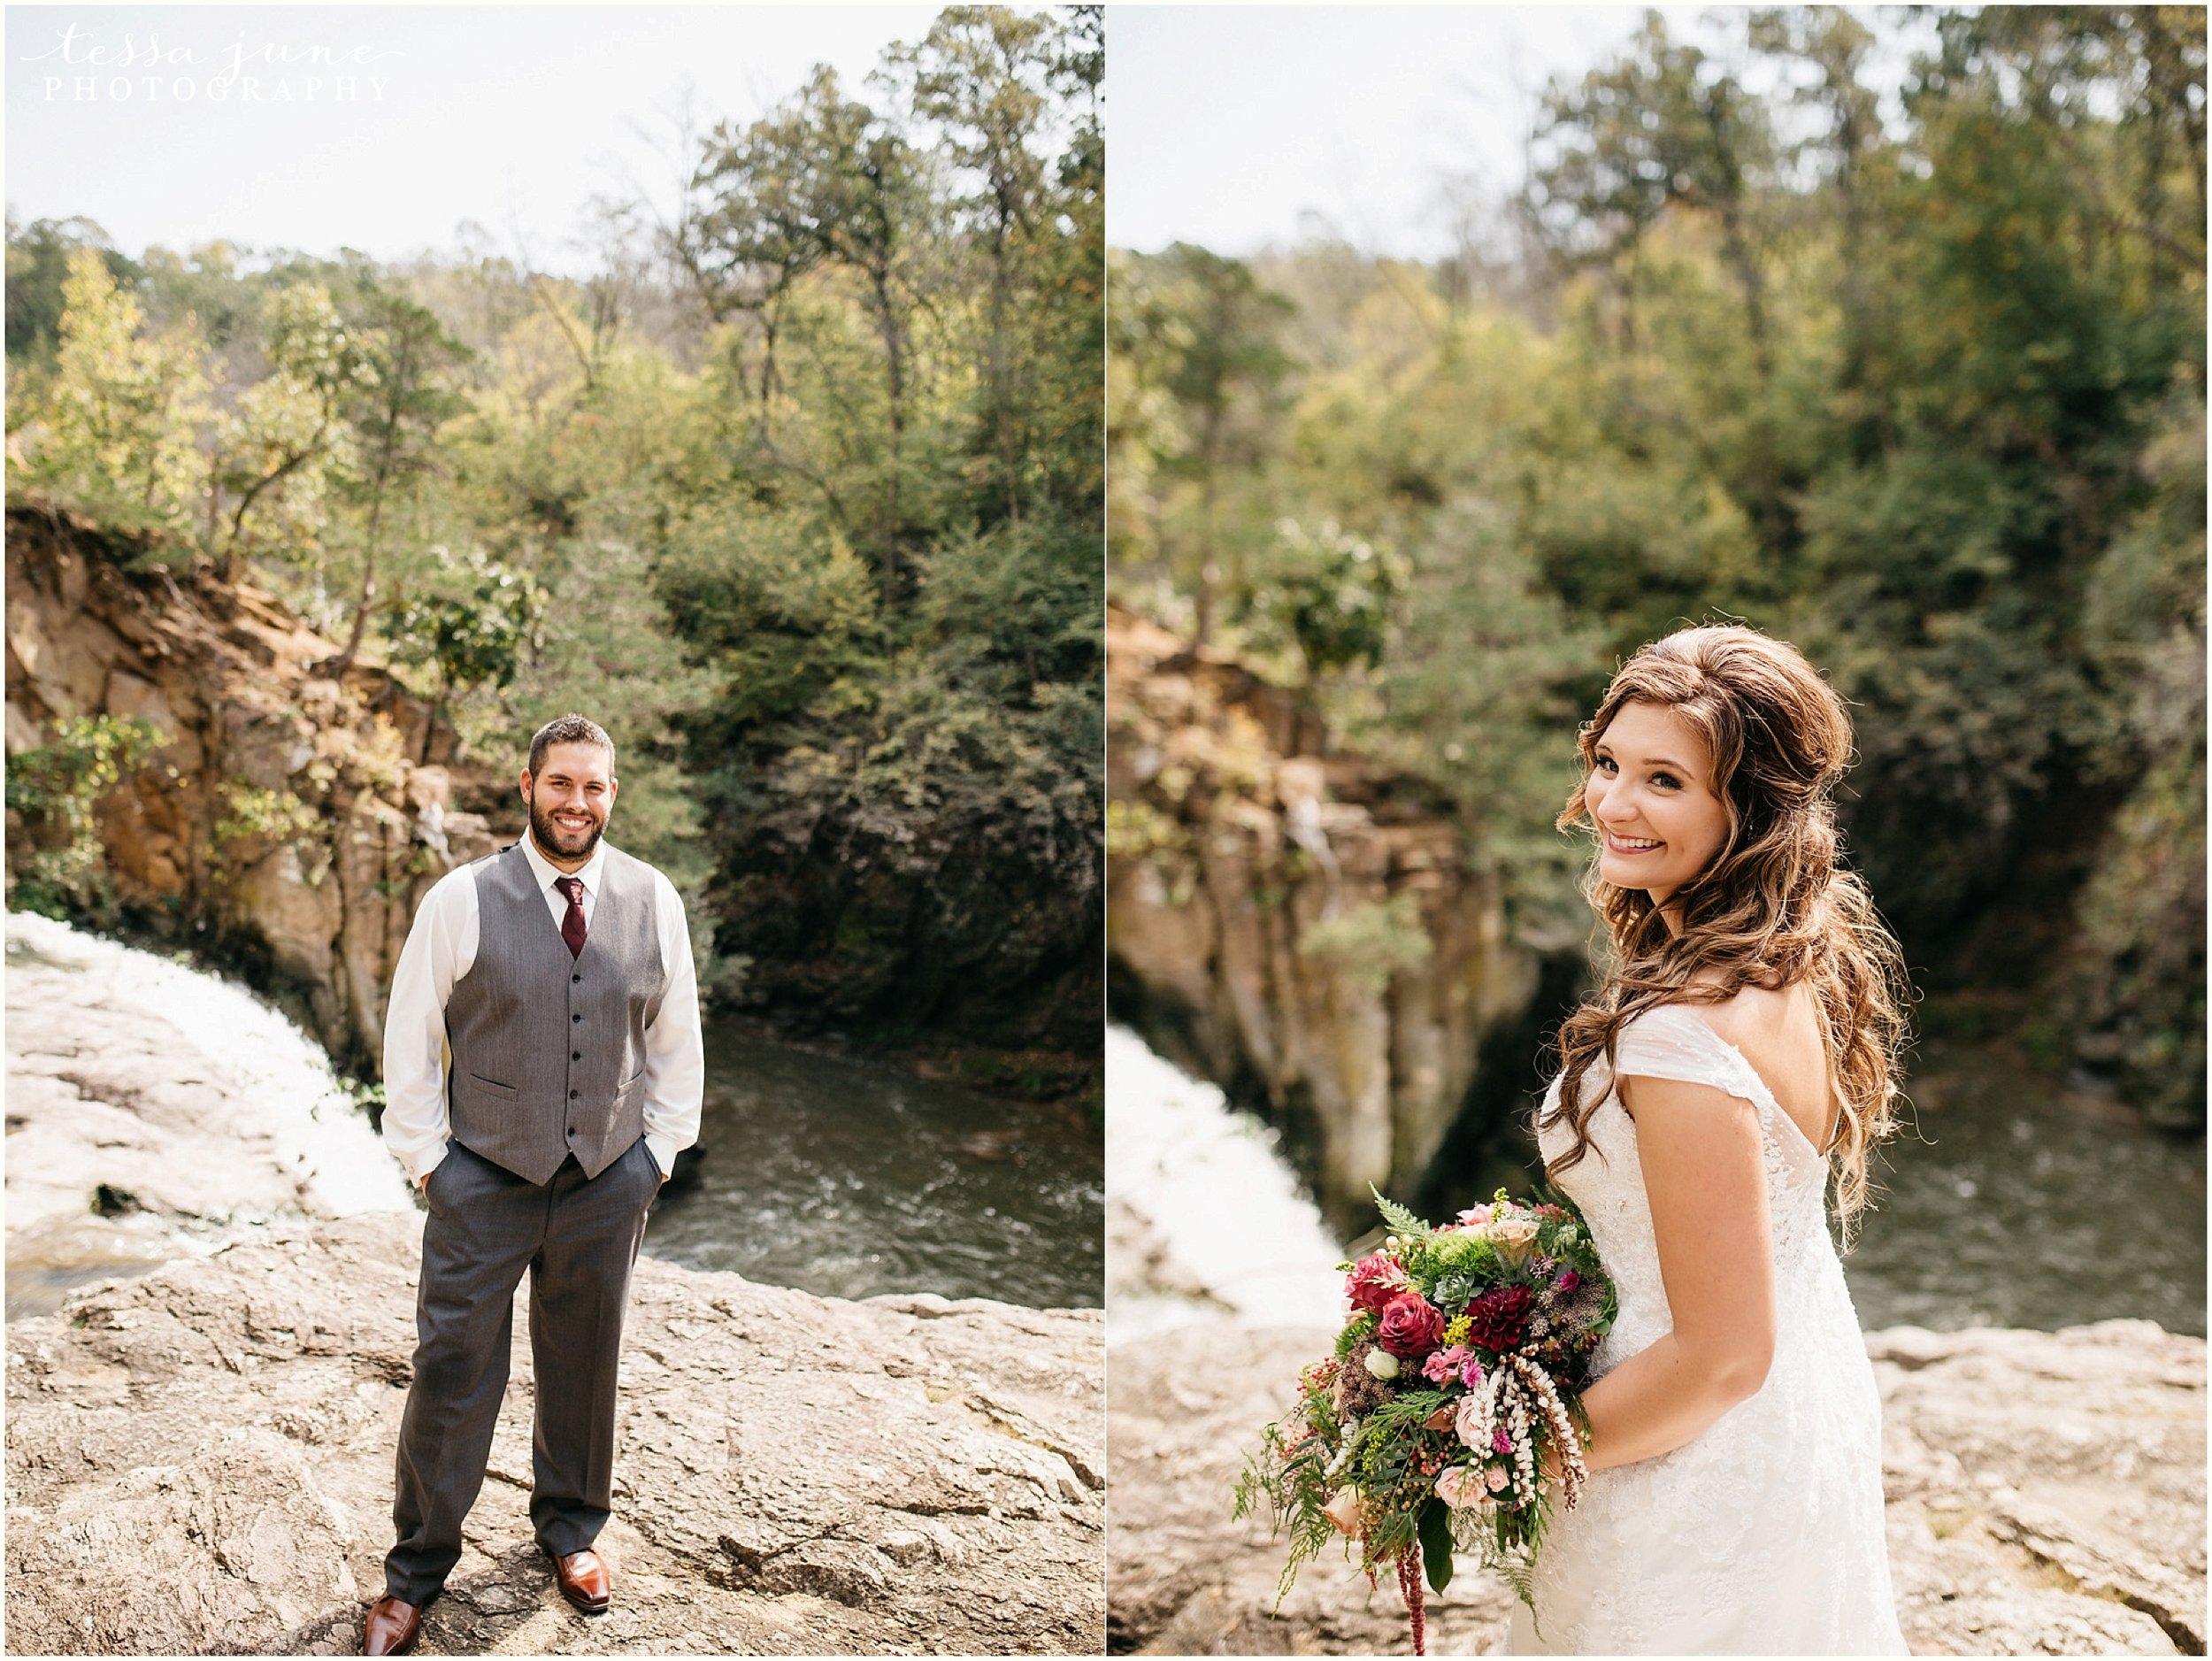 bohemian-minnesota-wedding-mismatched-bridesmaid-dresses-waterfall-st-cloud-tessa-june-photography-68.jpg